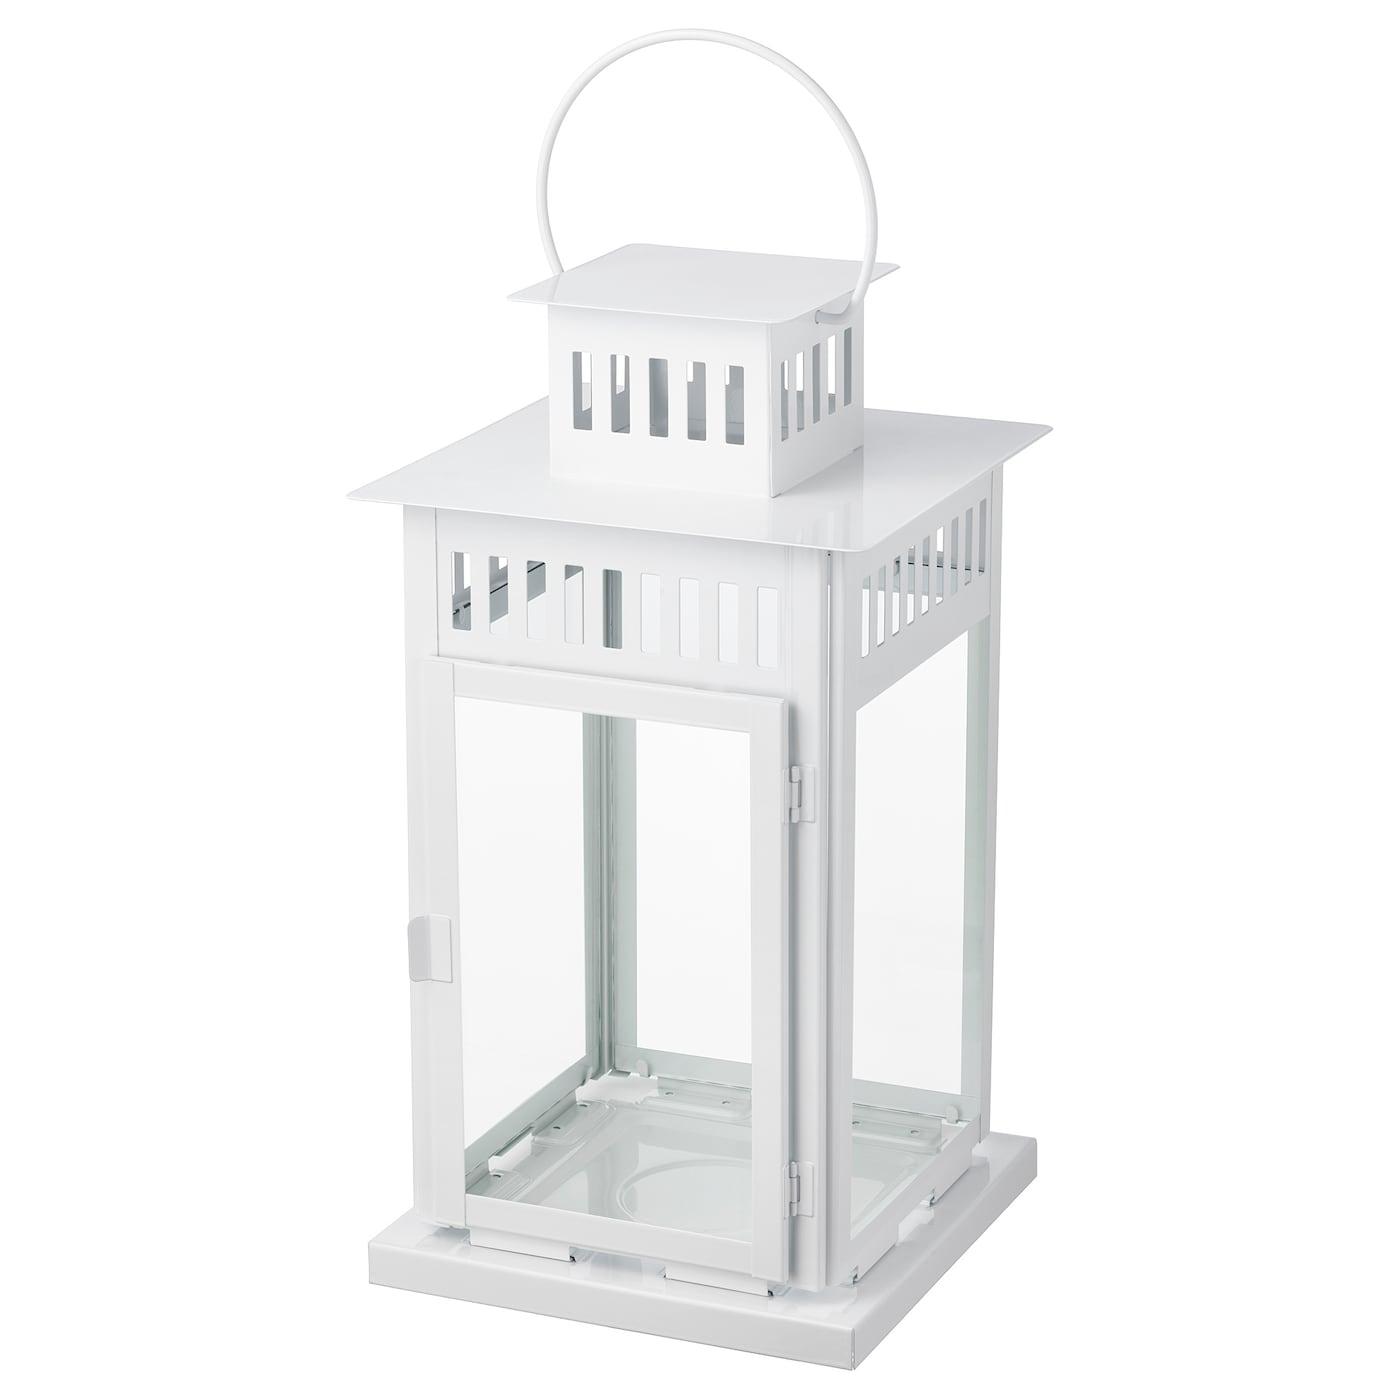 IKEA Lantern For Block Candle Garden Lamp White Interior//Exterior White 44cm